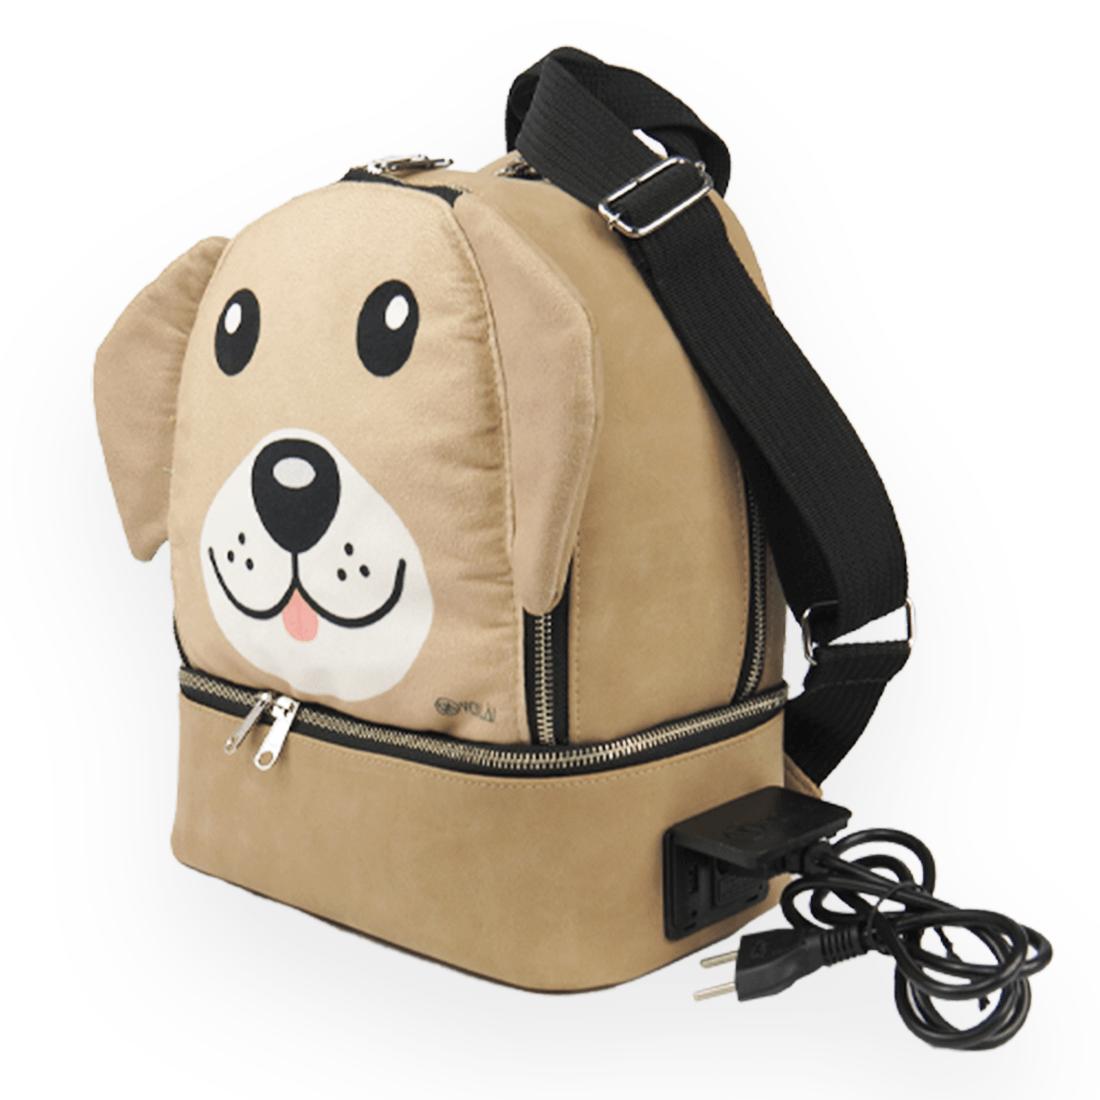 Mochila Elétrica Voilà! Bag Kids Baby - Zoo Dog